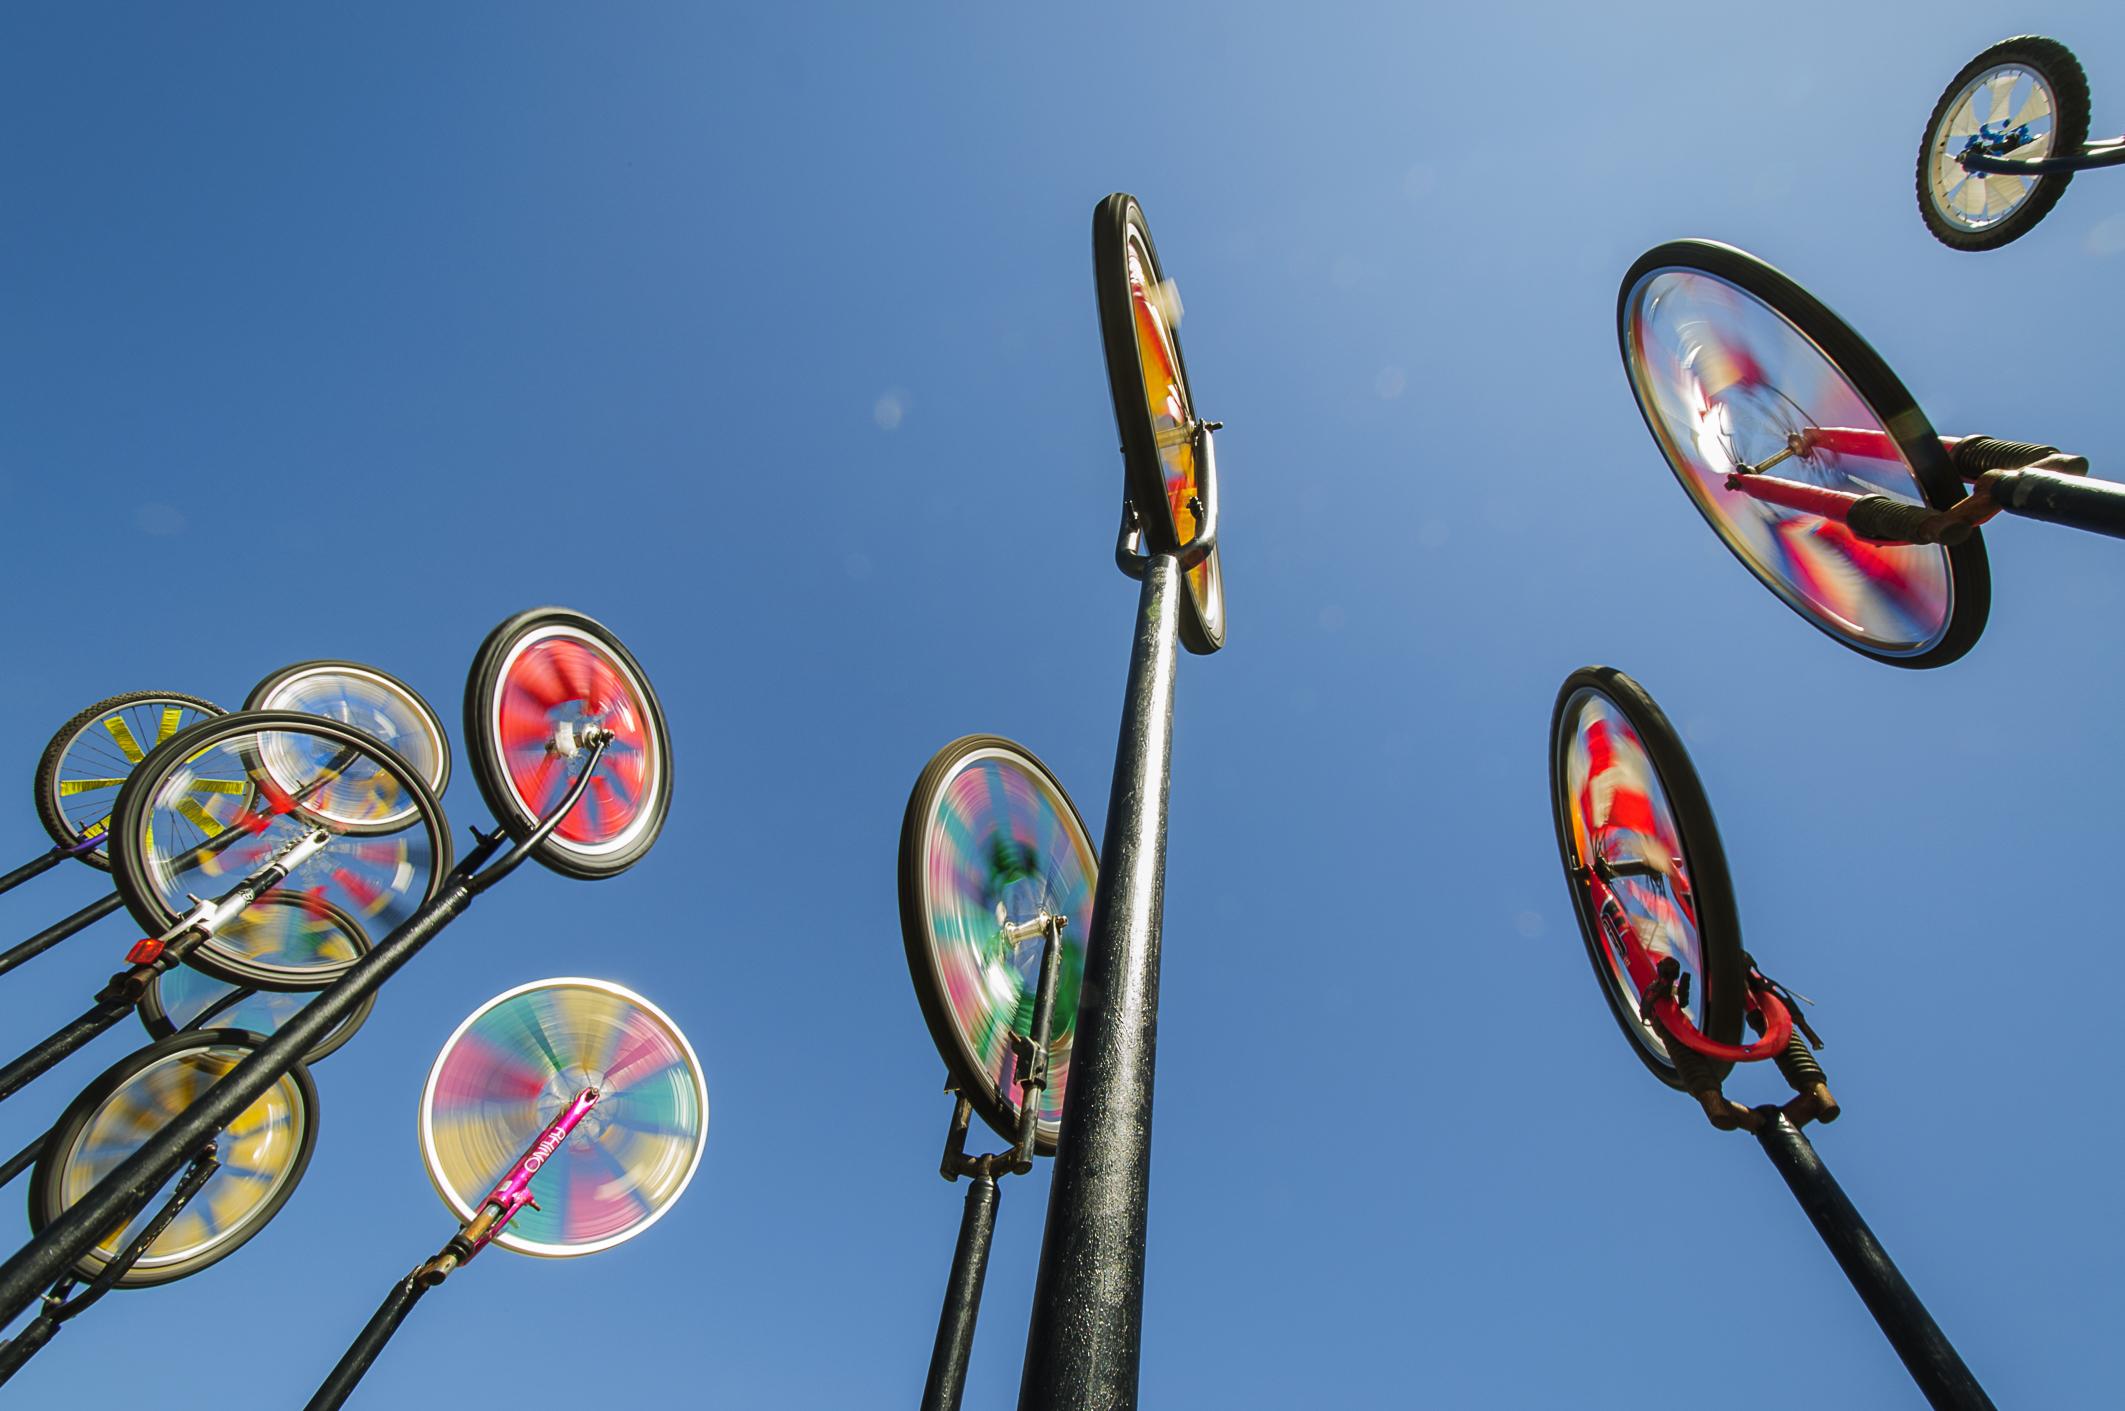 Ged McCormick Wheelie Windy Rowly Emmett Photography